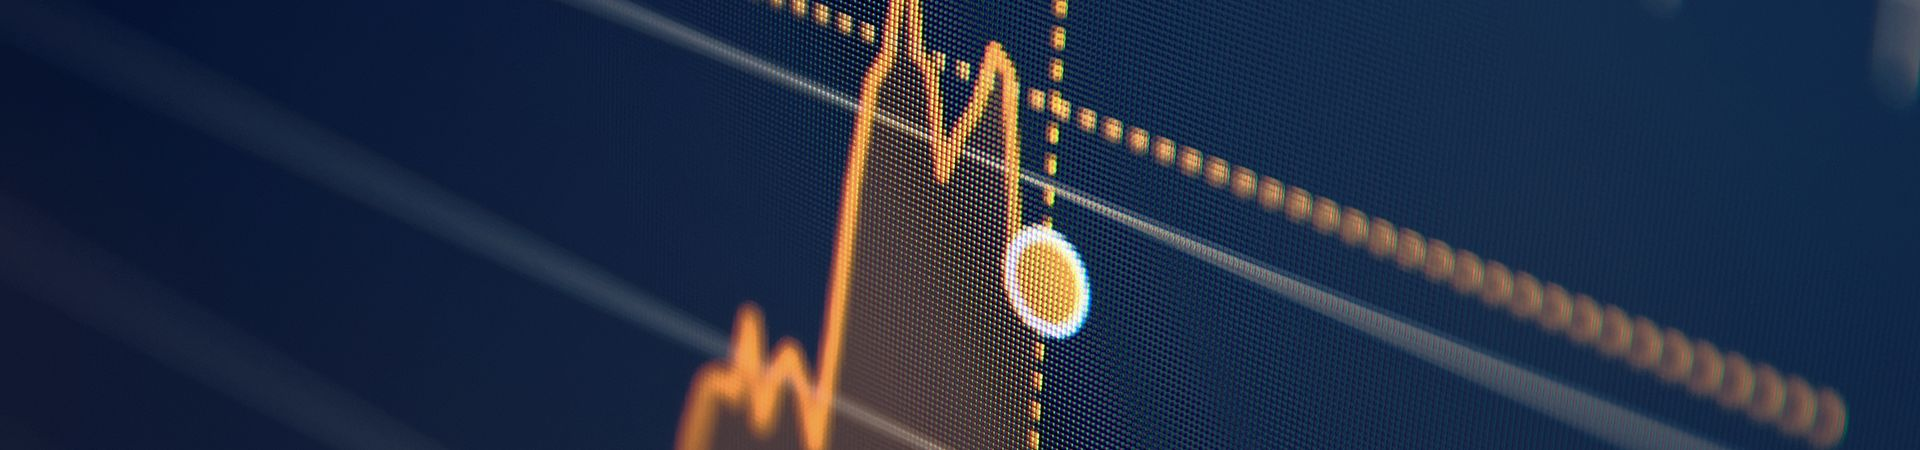 Energy Market Stabilises after Oil Prices Plummet